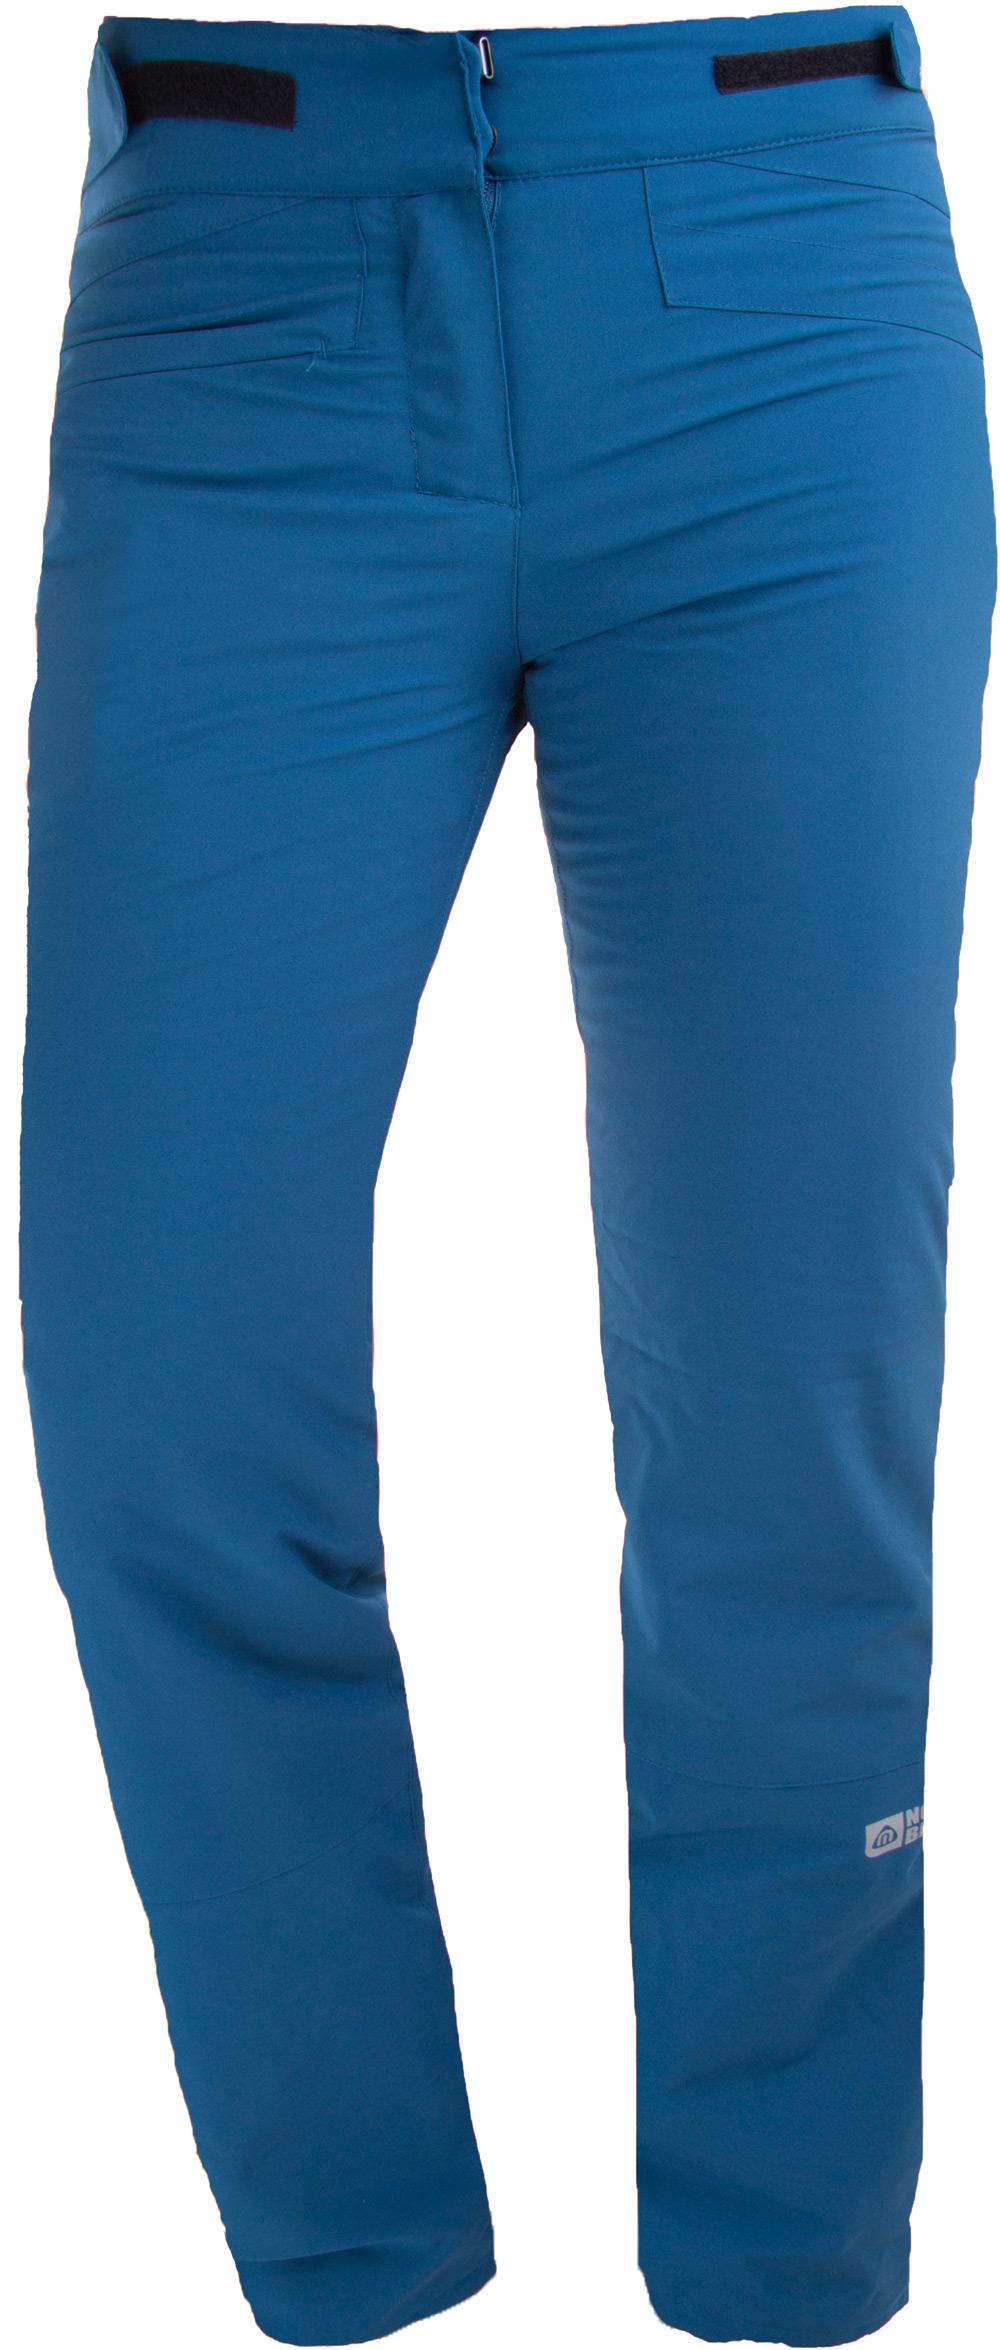 Lyžařské kalhoty dámské NORDBLANC Limpid - NBWP6440